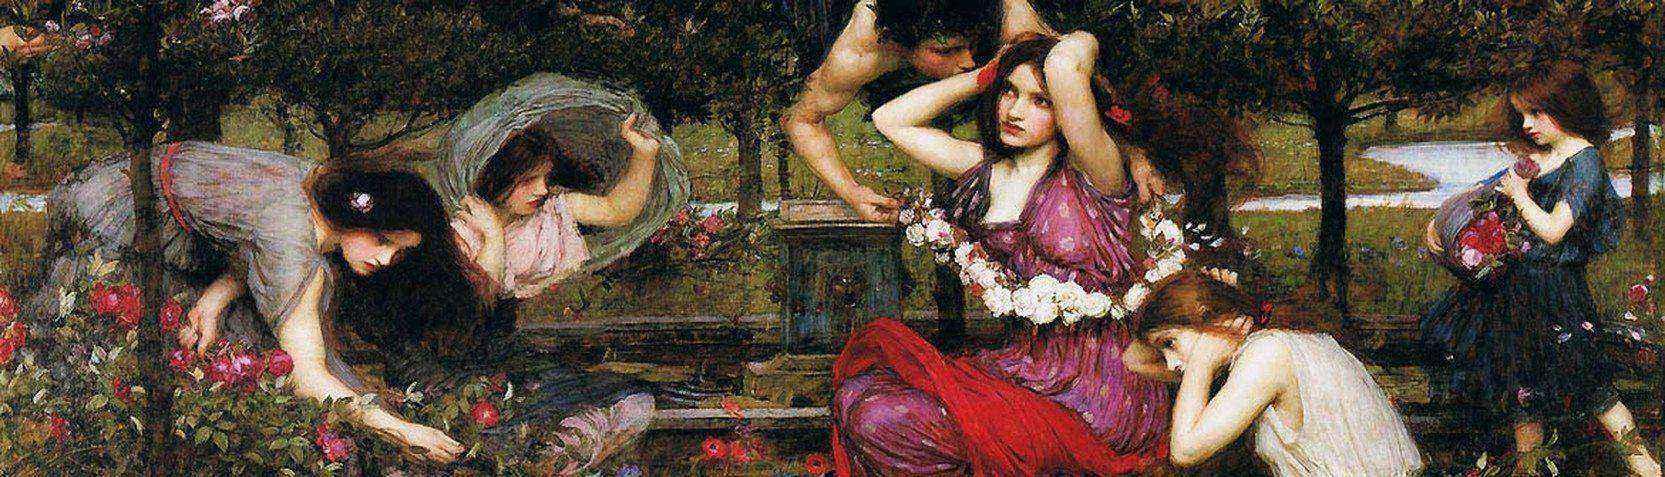 Artists - John William Waterhouse